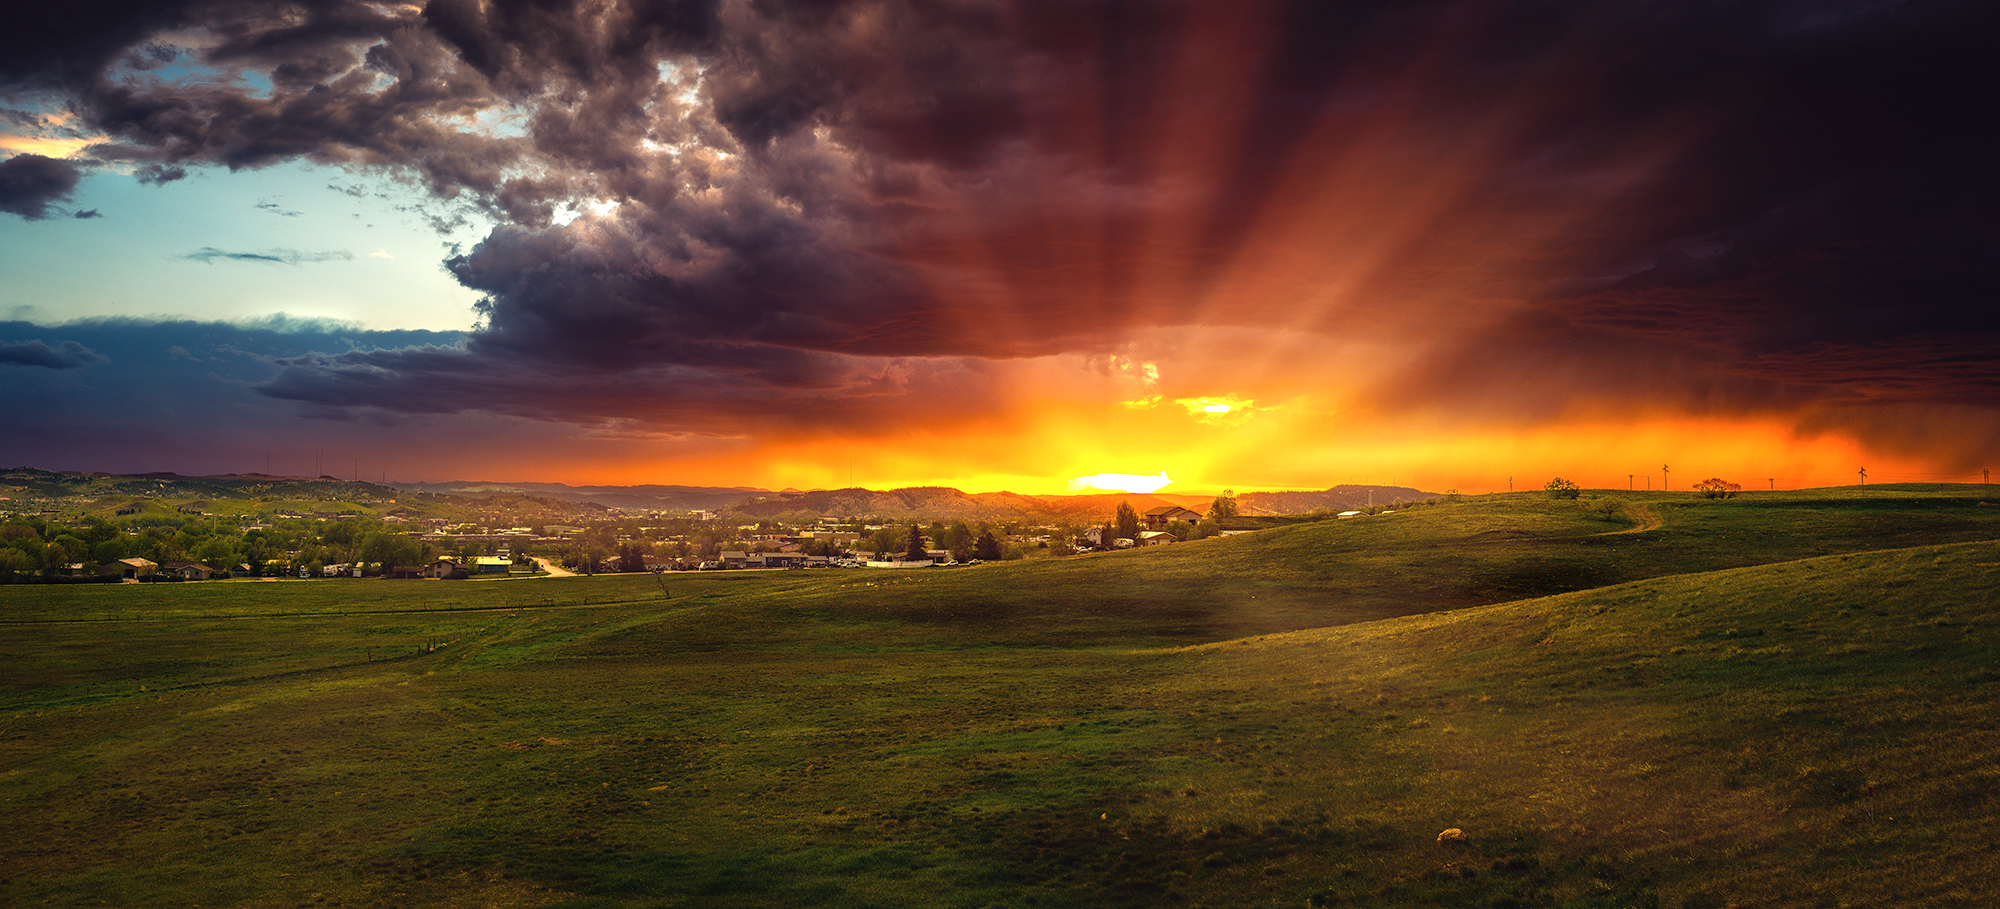 Lisa Kerner   Storms Coming   ©2018LisaKernerDesign